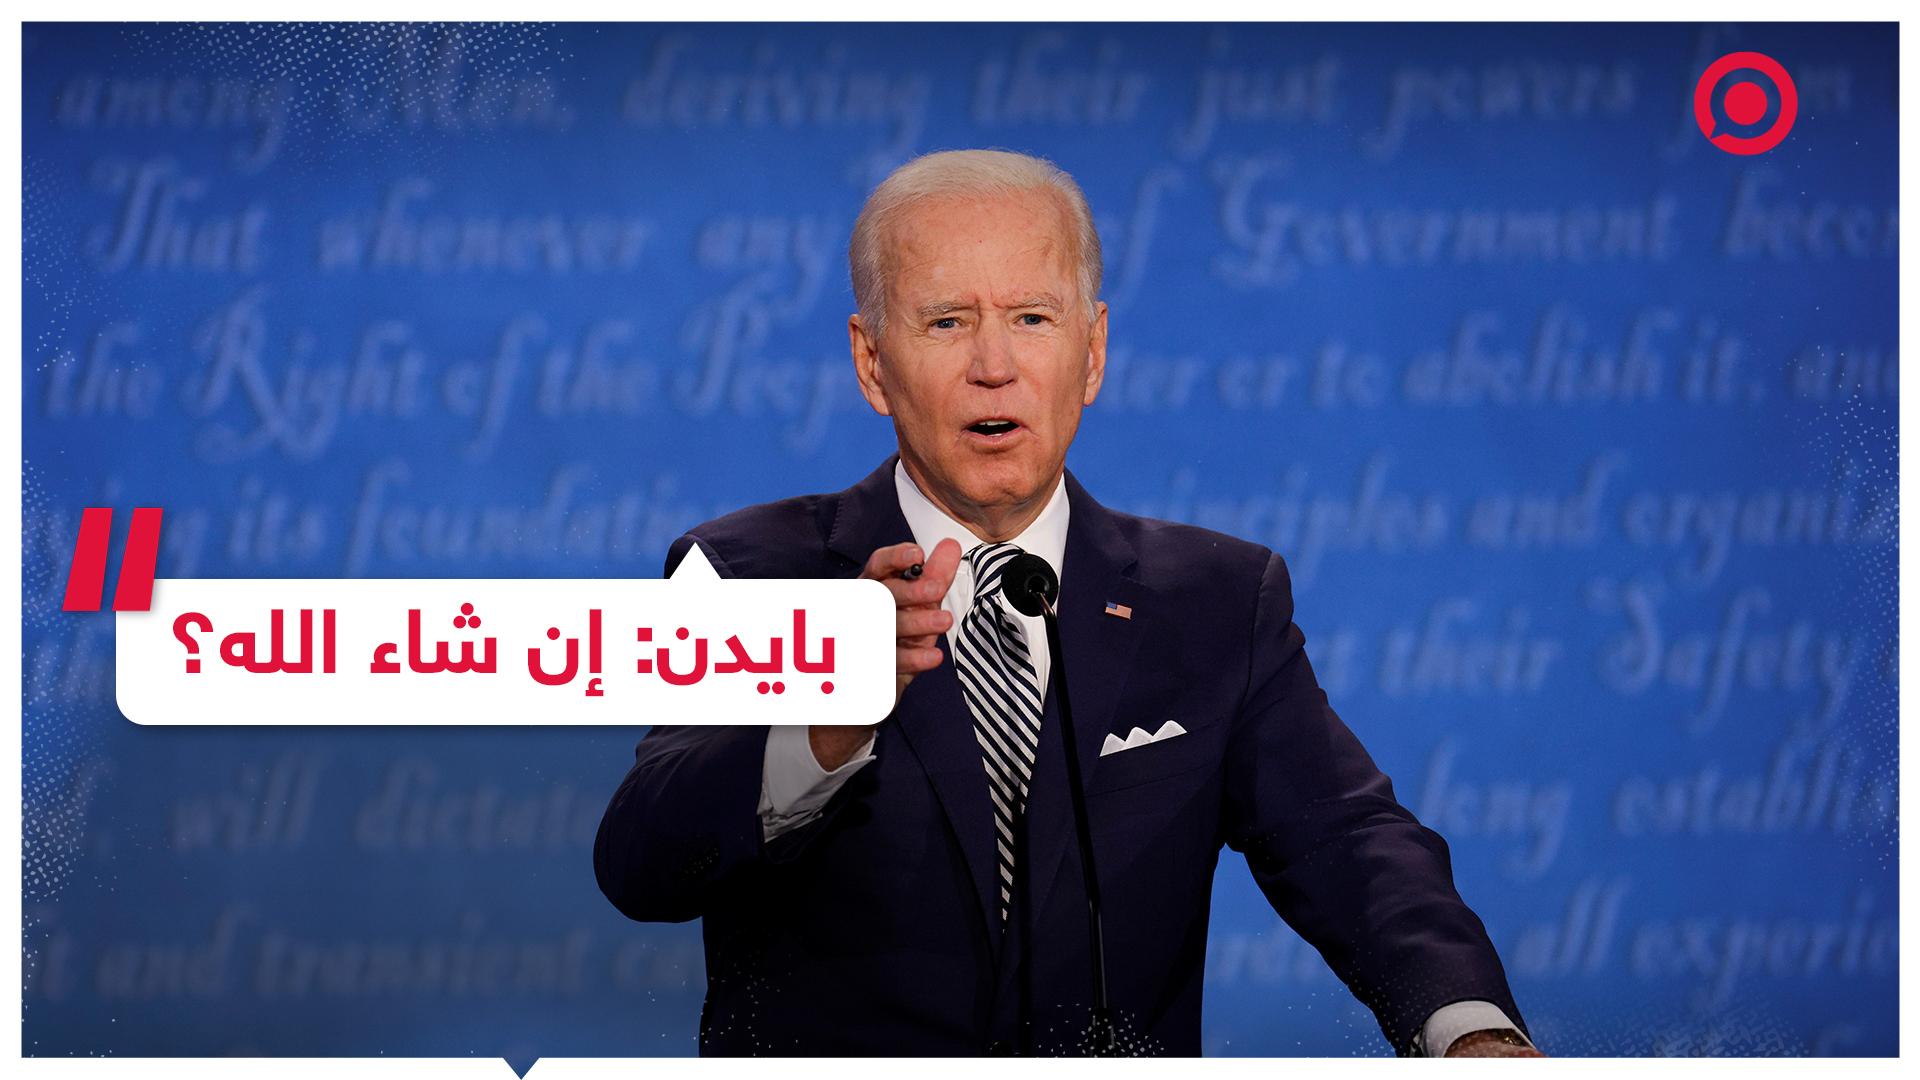 جو بايدن مخاطبا ترامب: متى؟ إن شاء الله؟